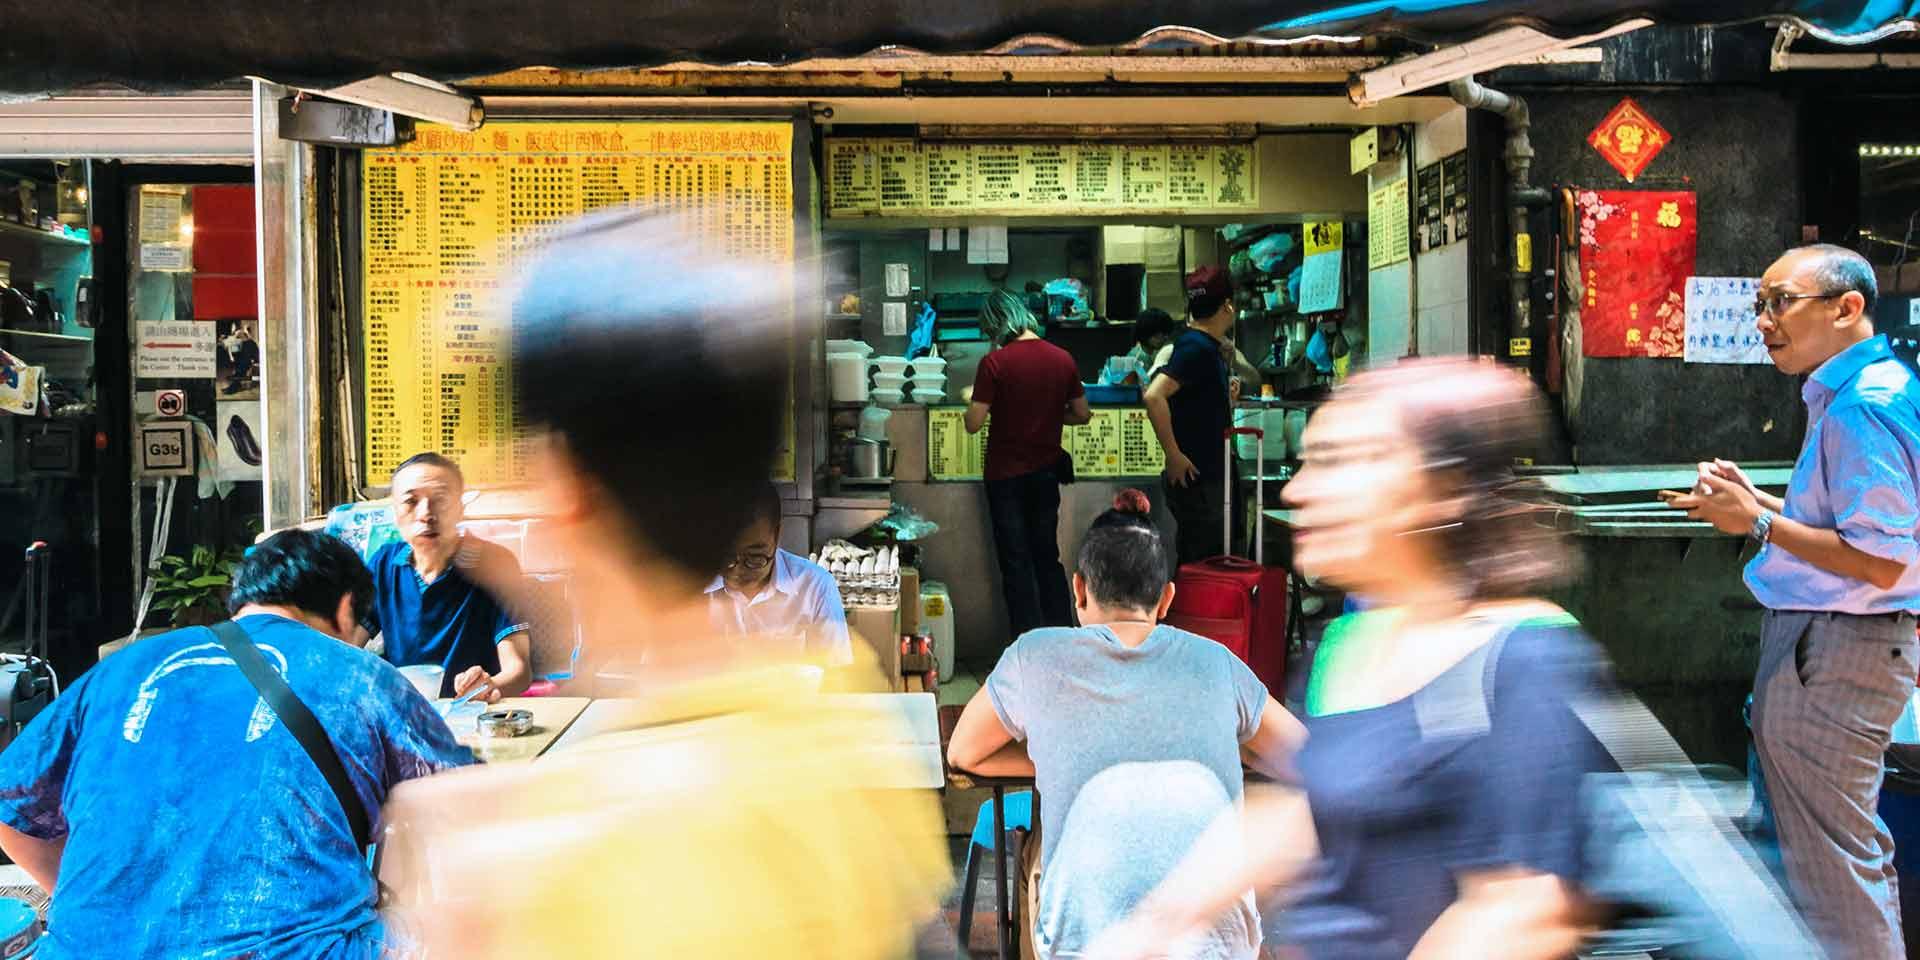 Take a Whirlwind Tour of Hong Kong's Best-Kept Secrets